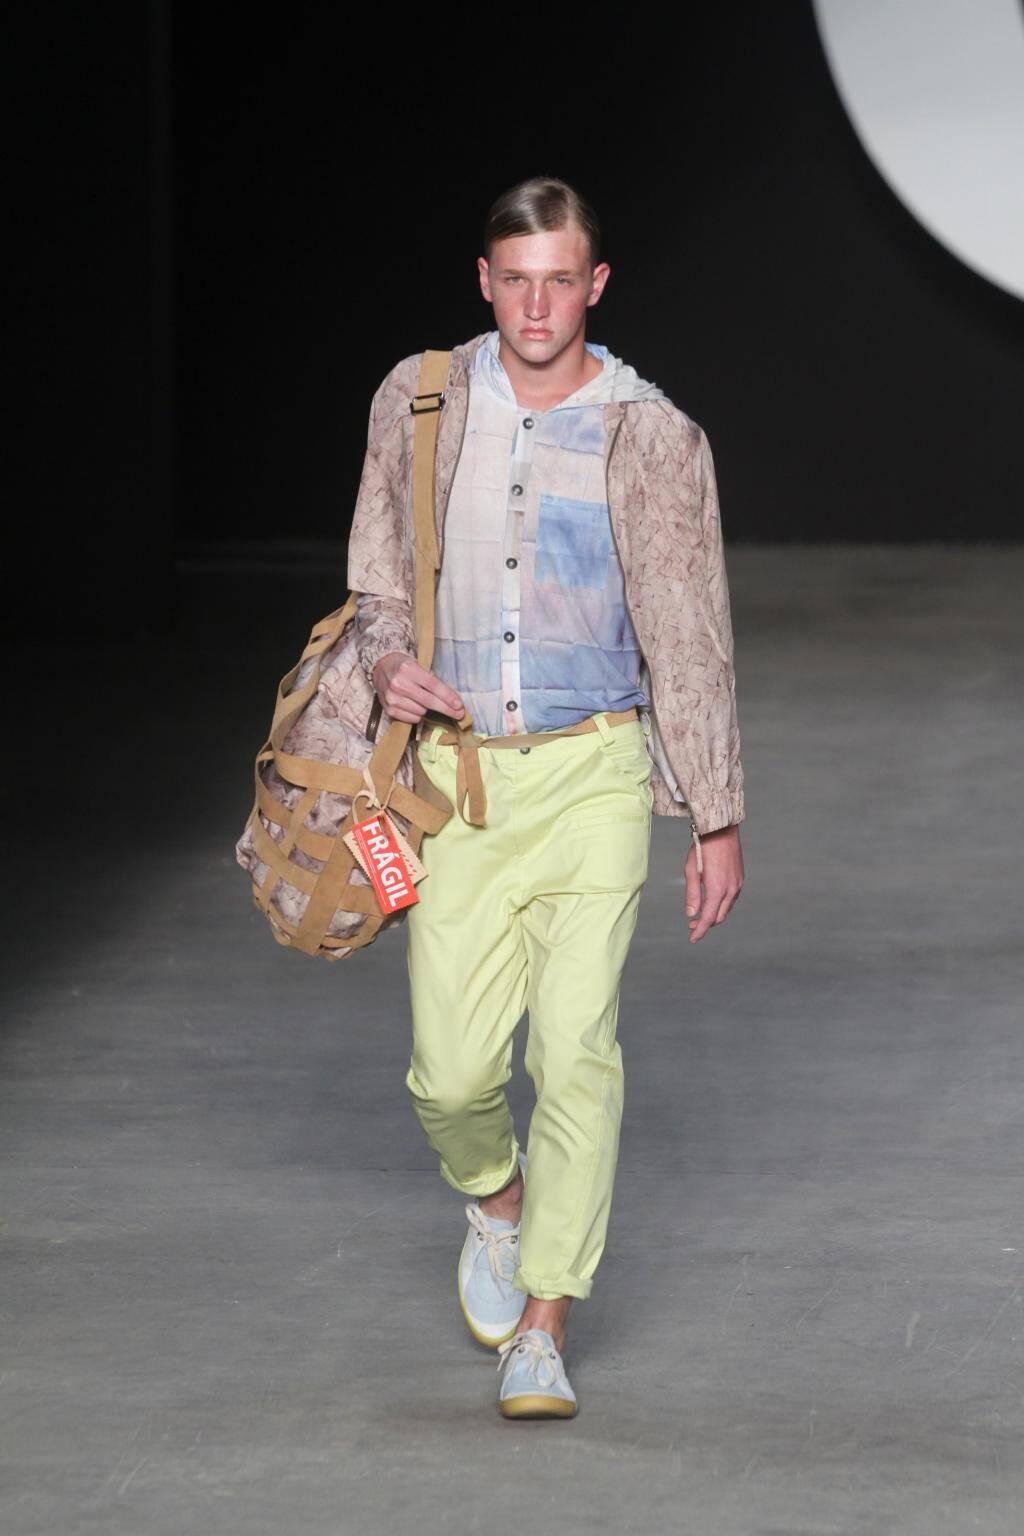 OESTUDIO, sapato desejo + calça amarela, bolsa